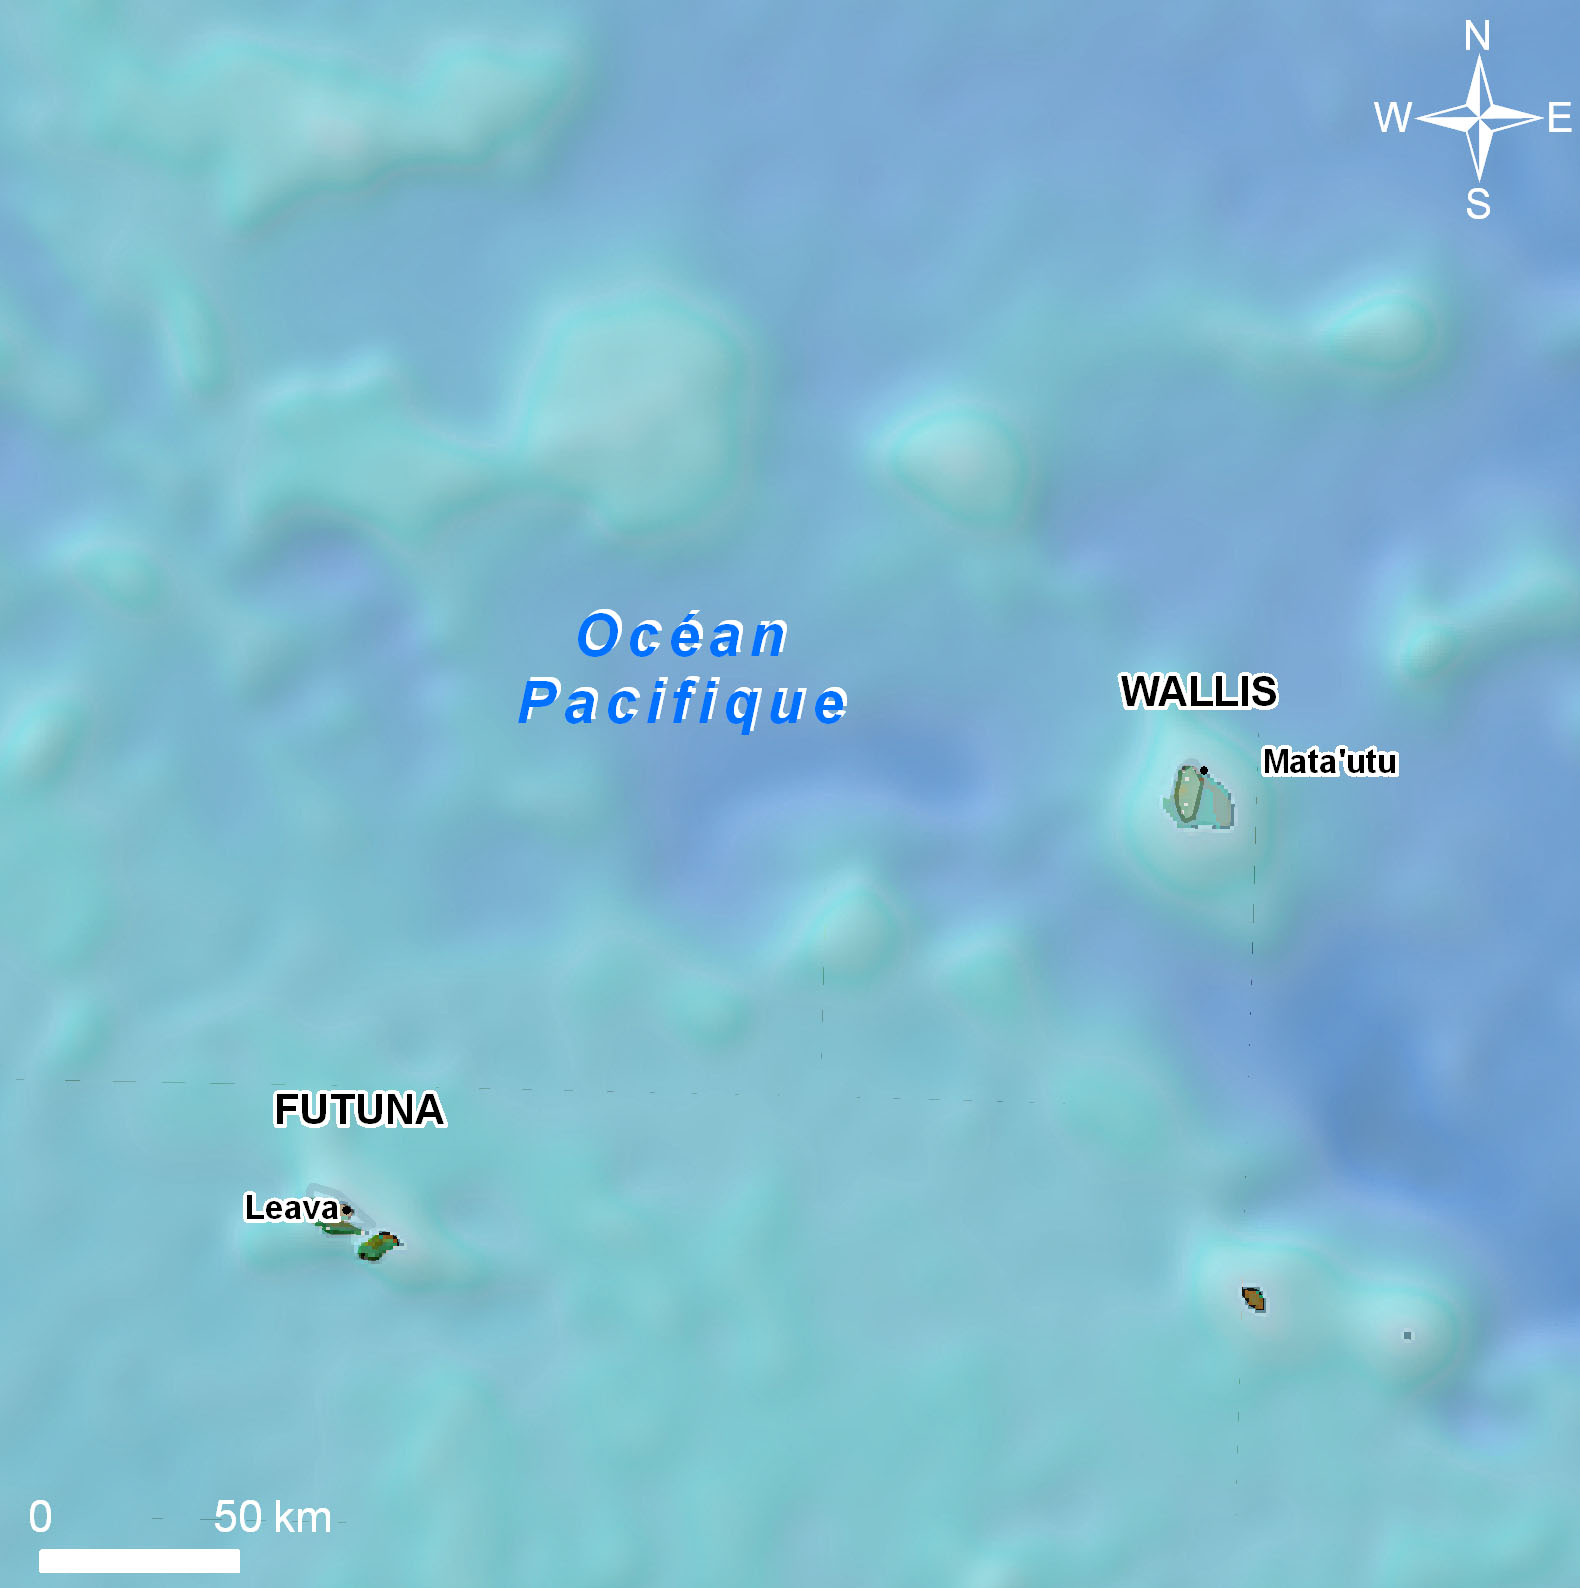 Остров Уоллис Остров Футуна TW0F FW0R Карта